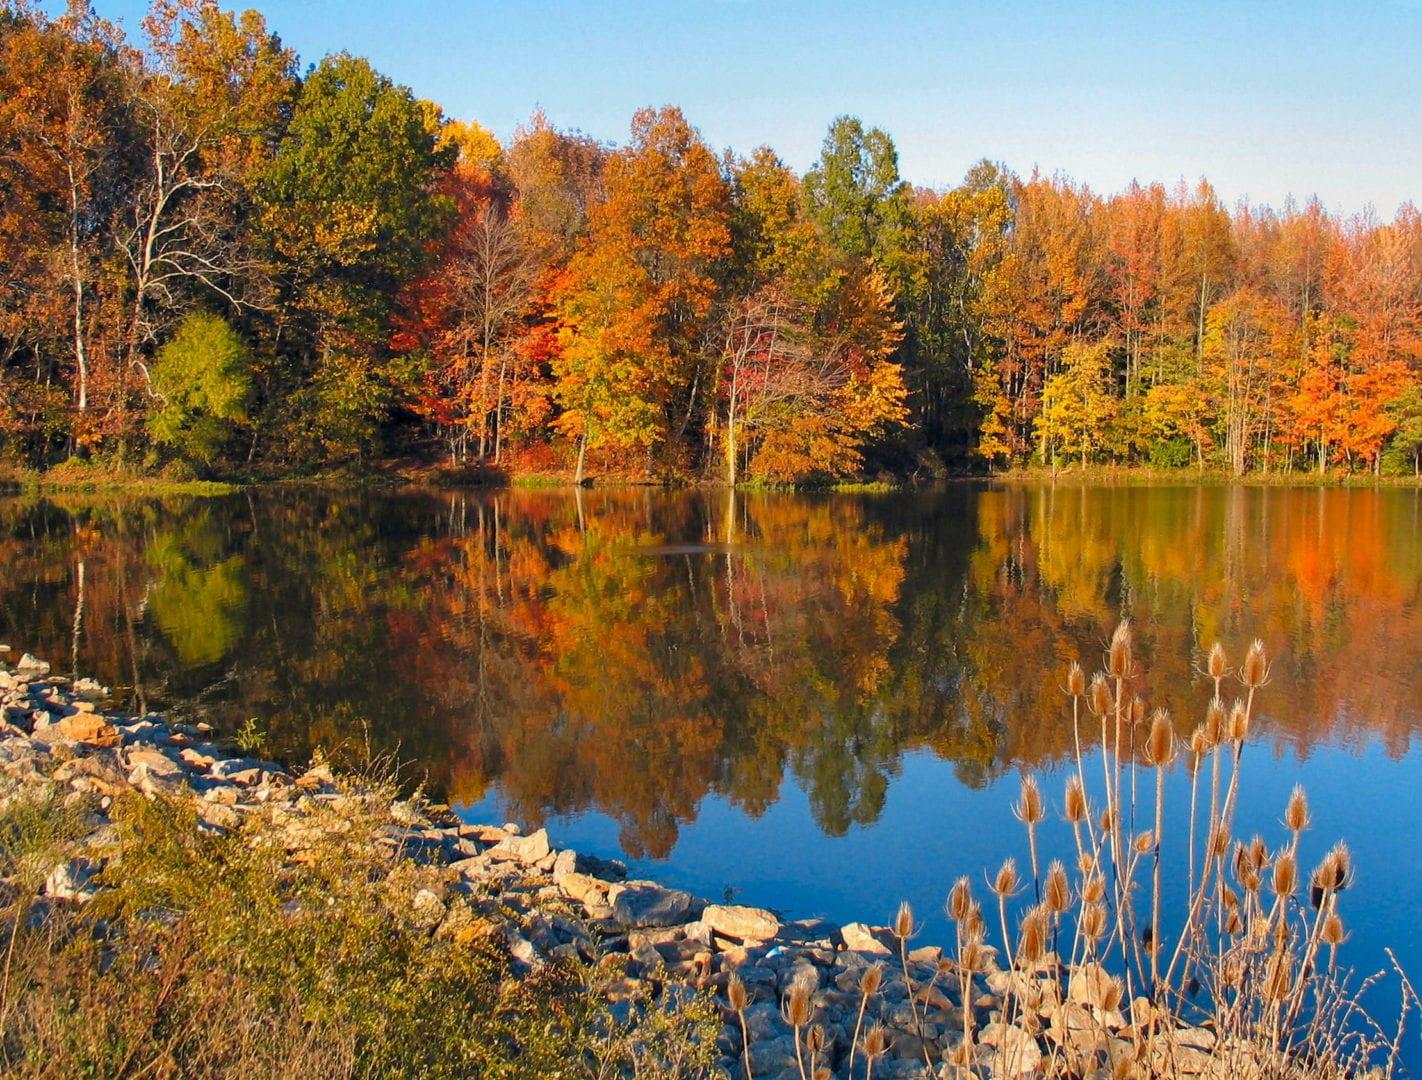 Stonelick Lake during autumn